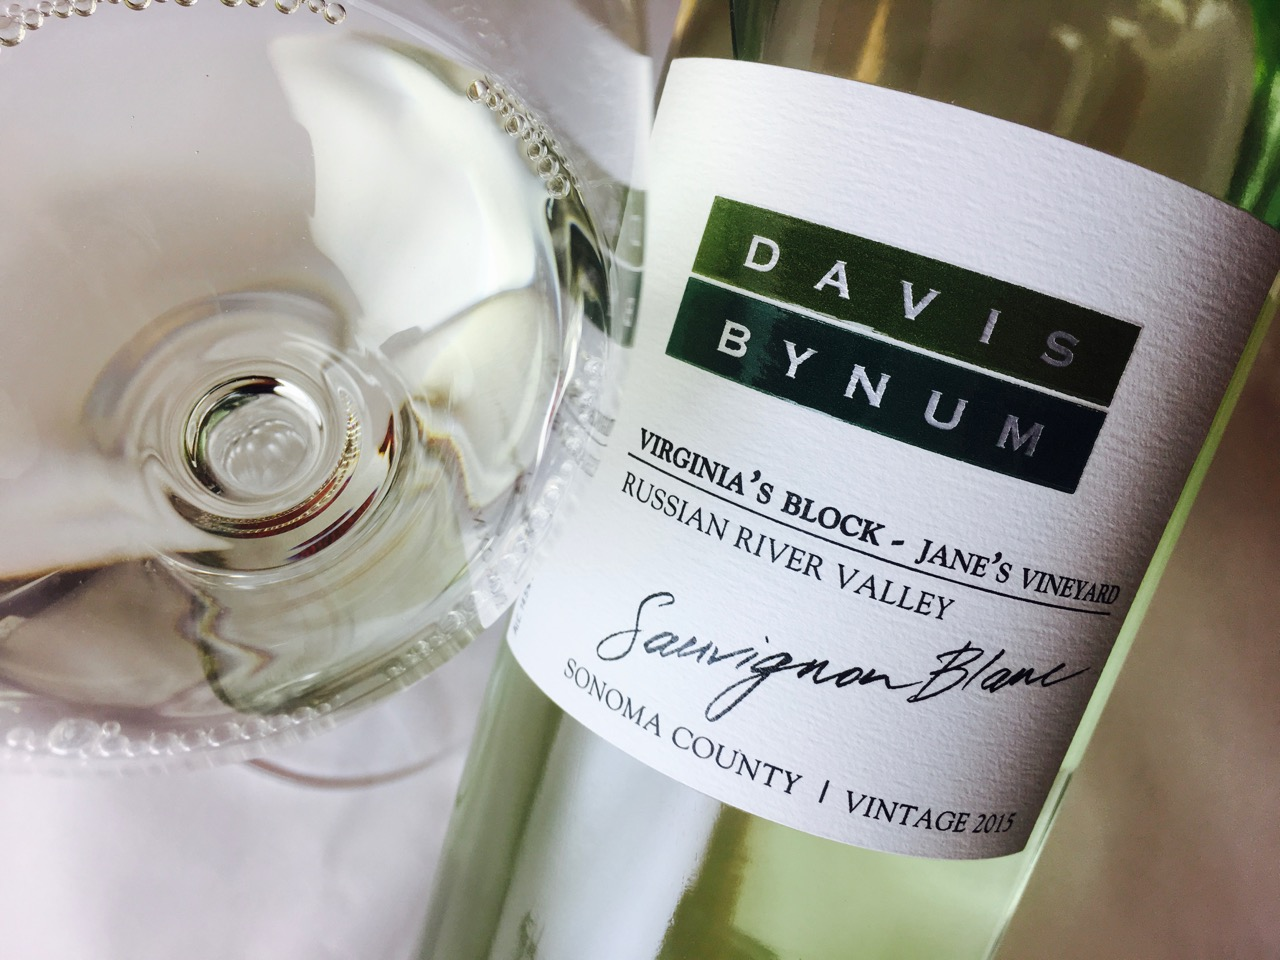 2015 Davis Bynum Sauvignon Blanc Virginia's Block Jane's Vineyard Russian River Valley, Sonoma County